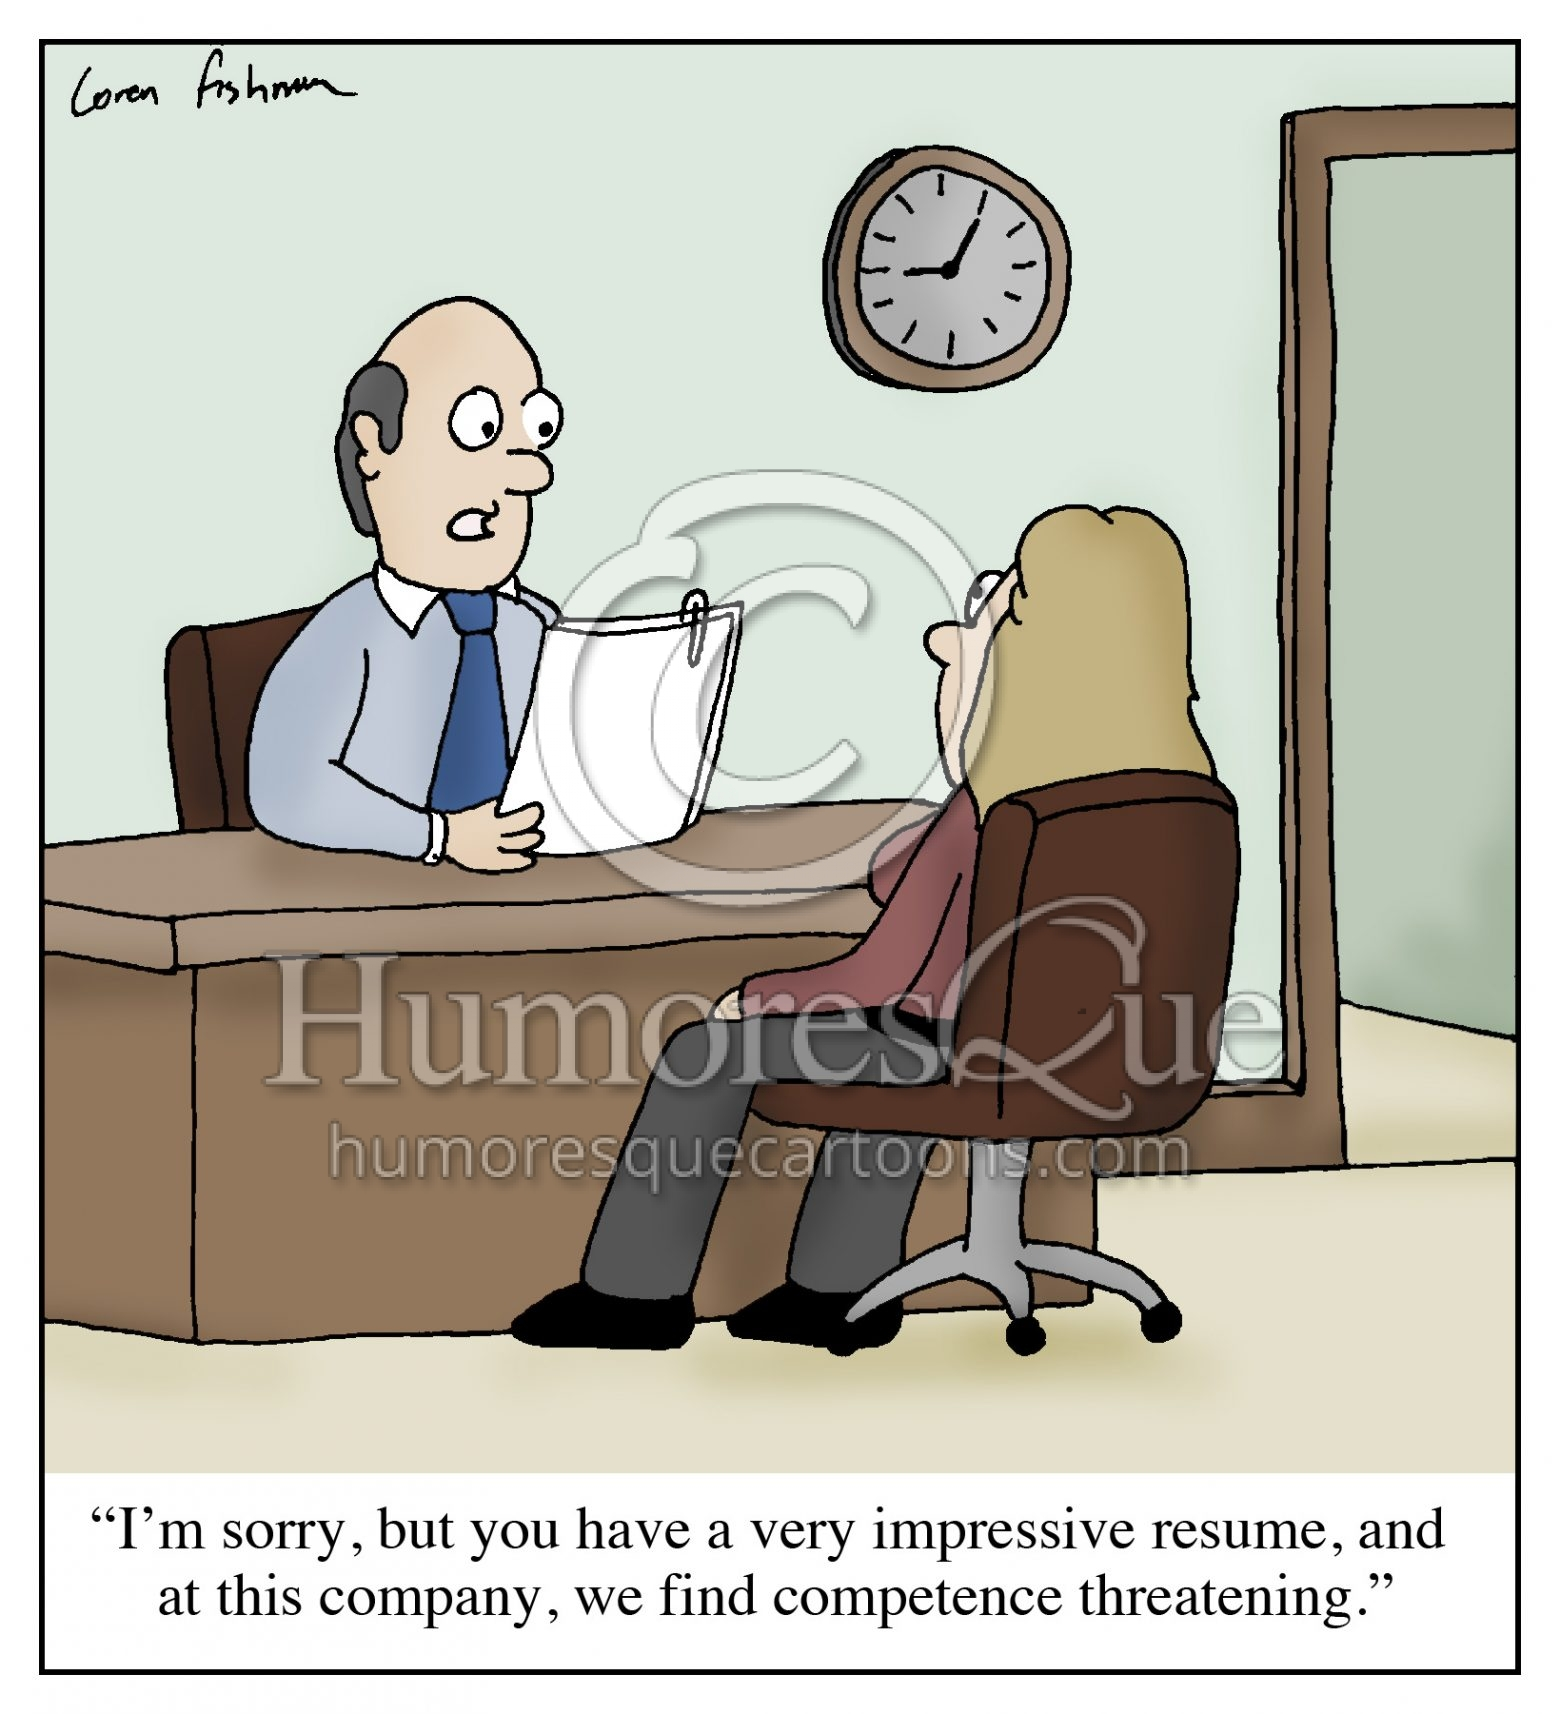 competence threatening hr job interview cartoon